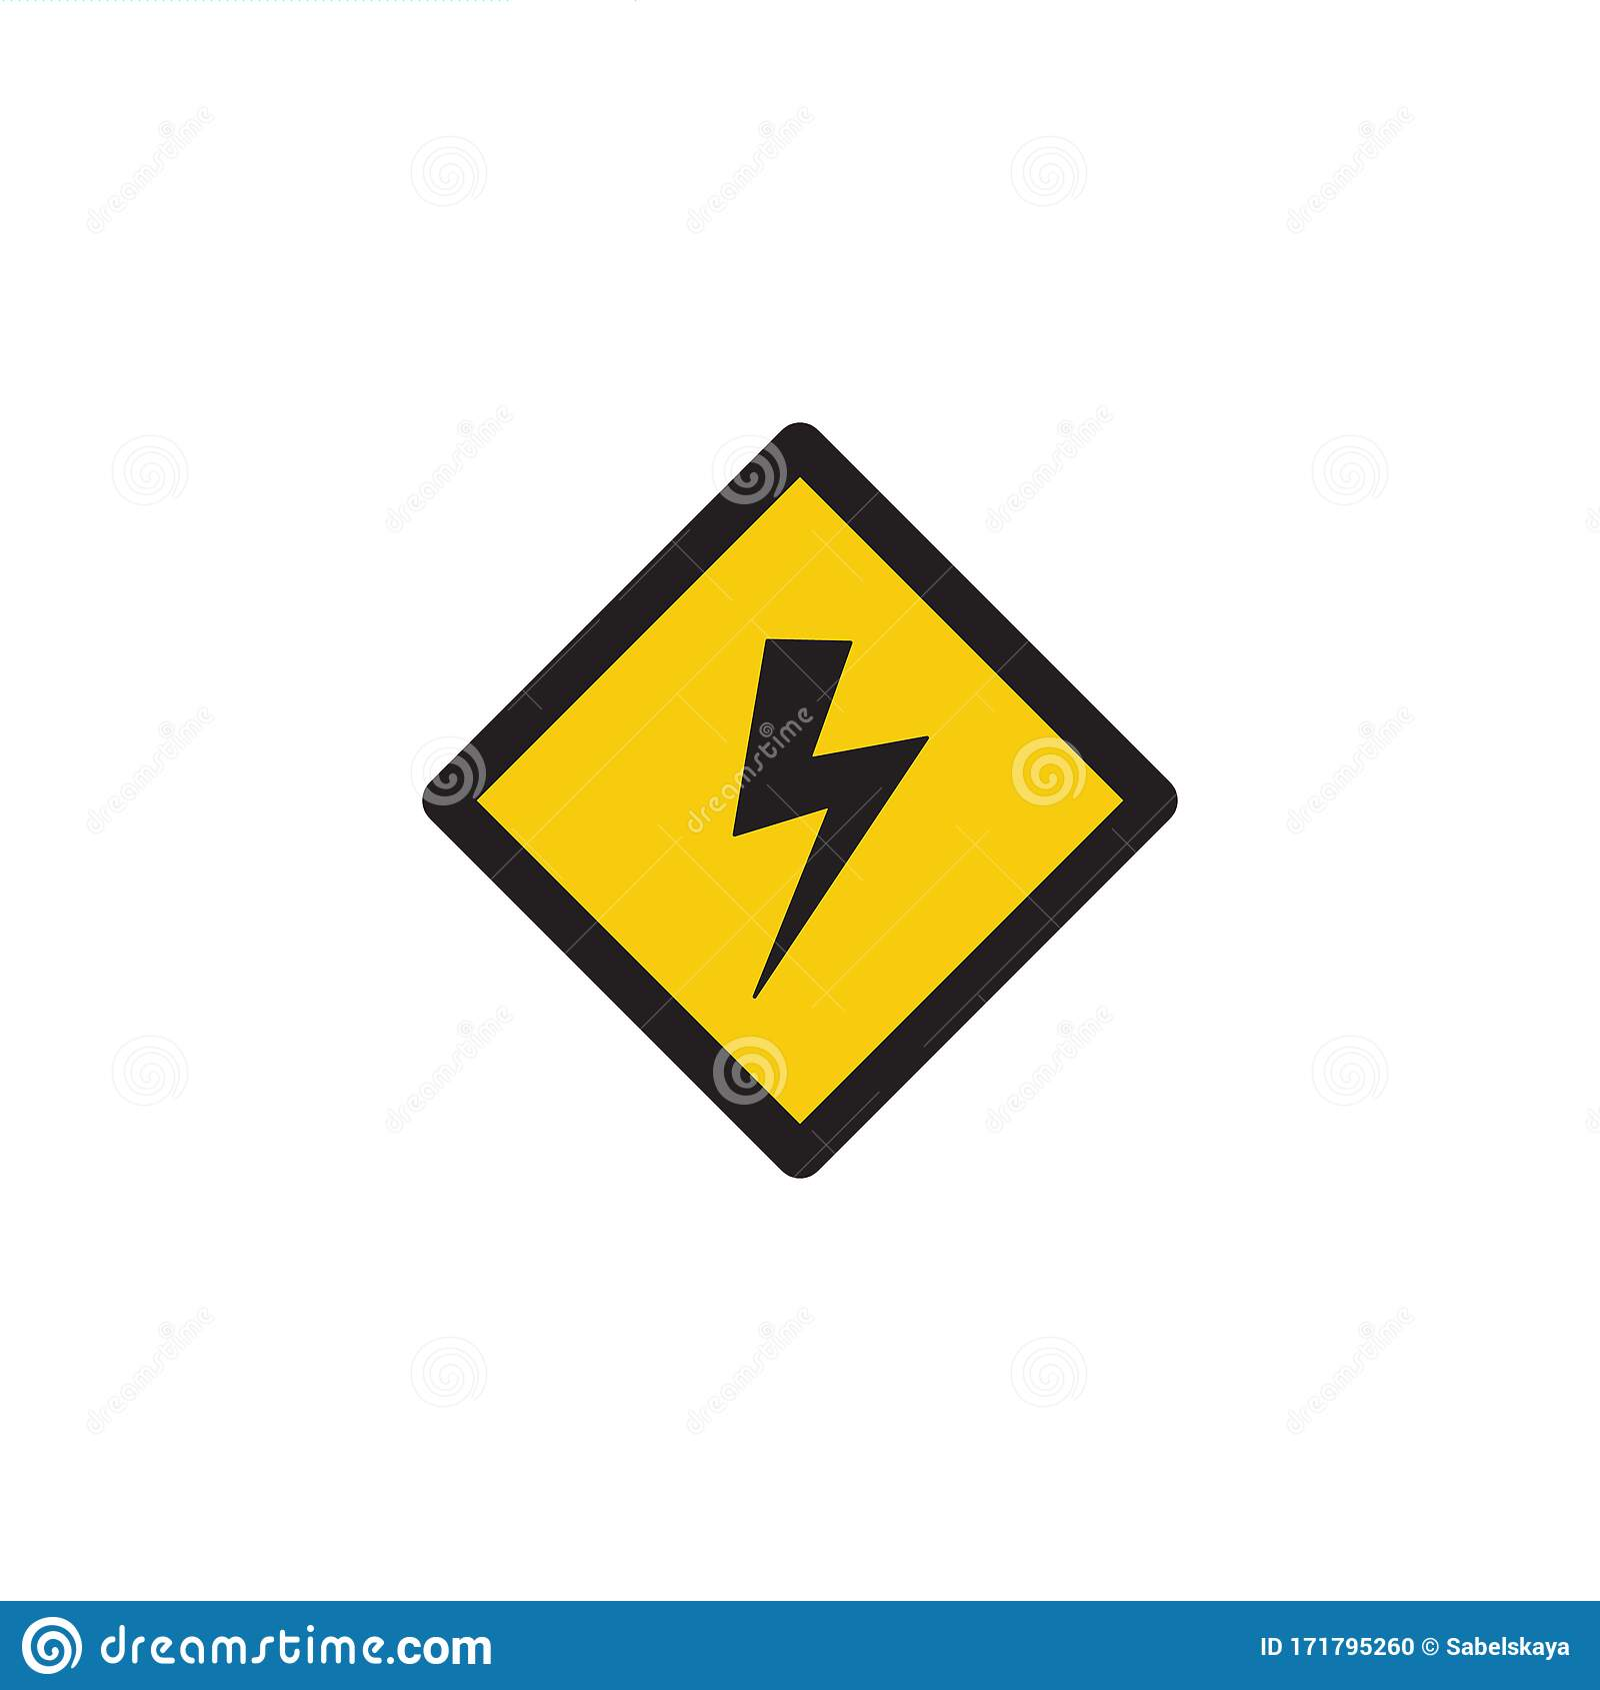 Lightning Bolt Symbol in Yellow High Voltage Danger Warning Sign ...